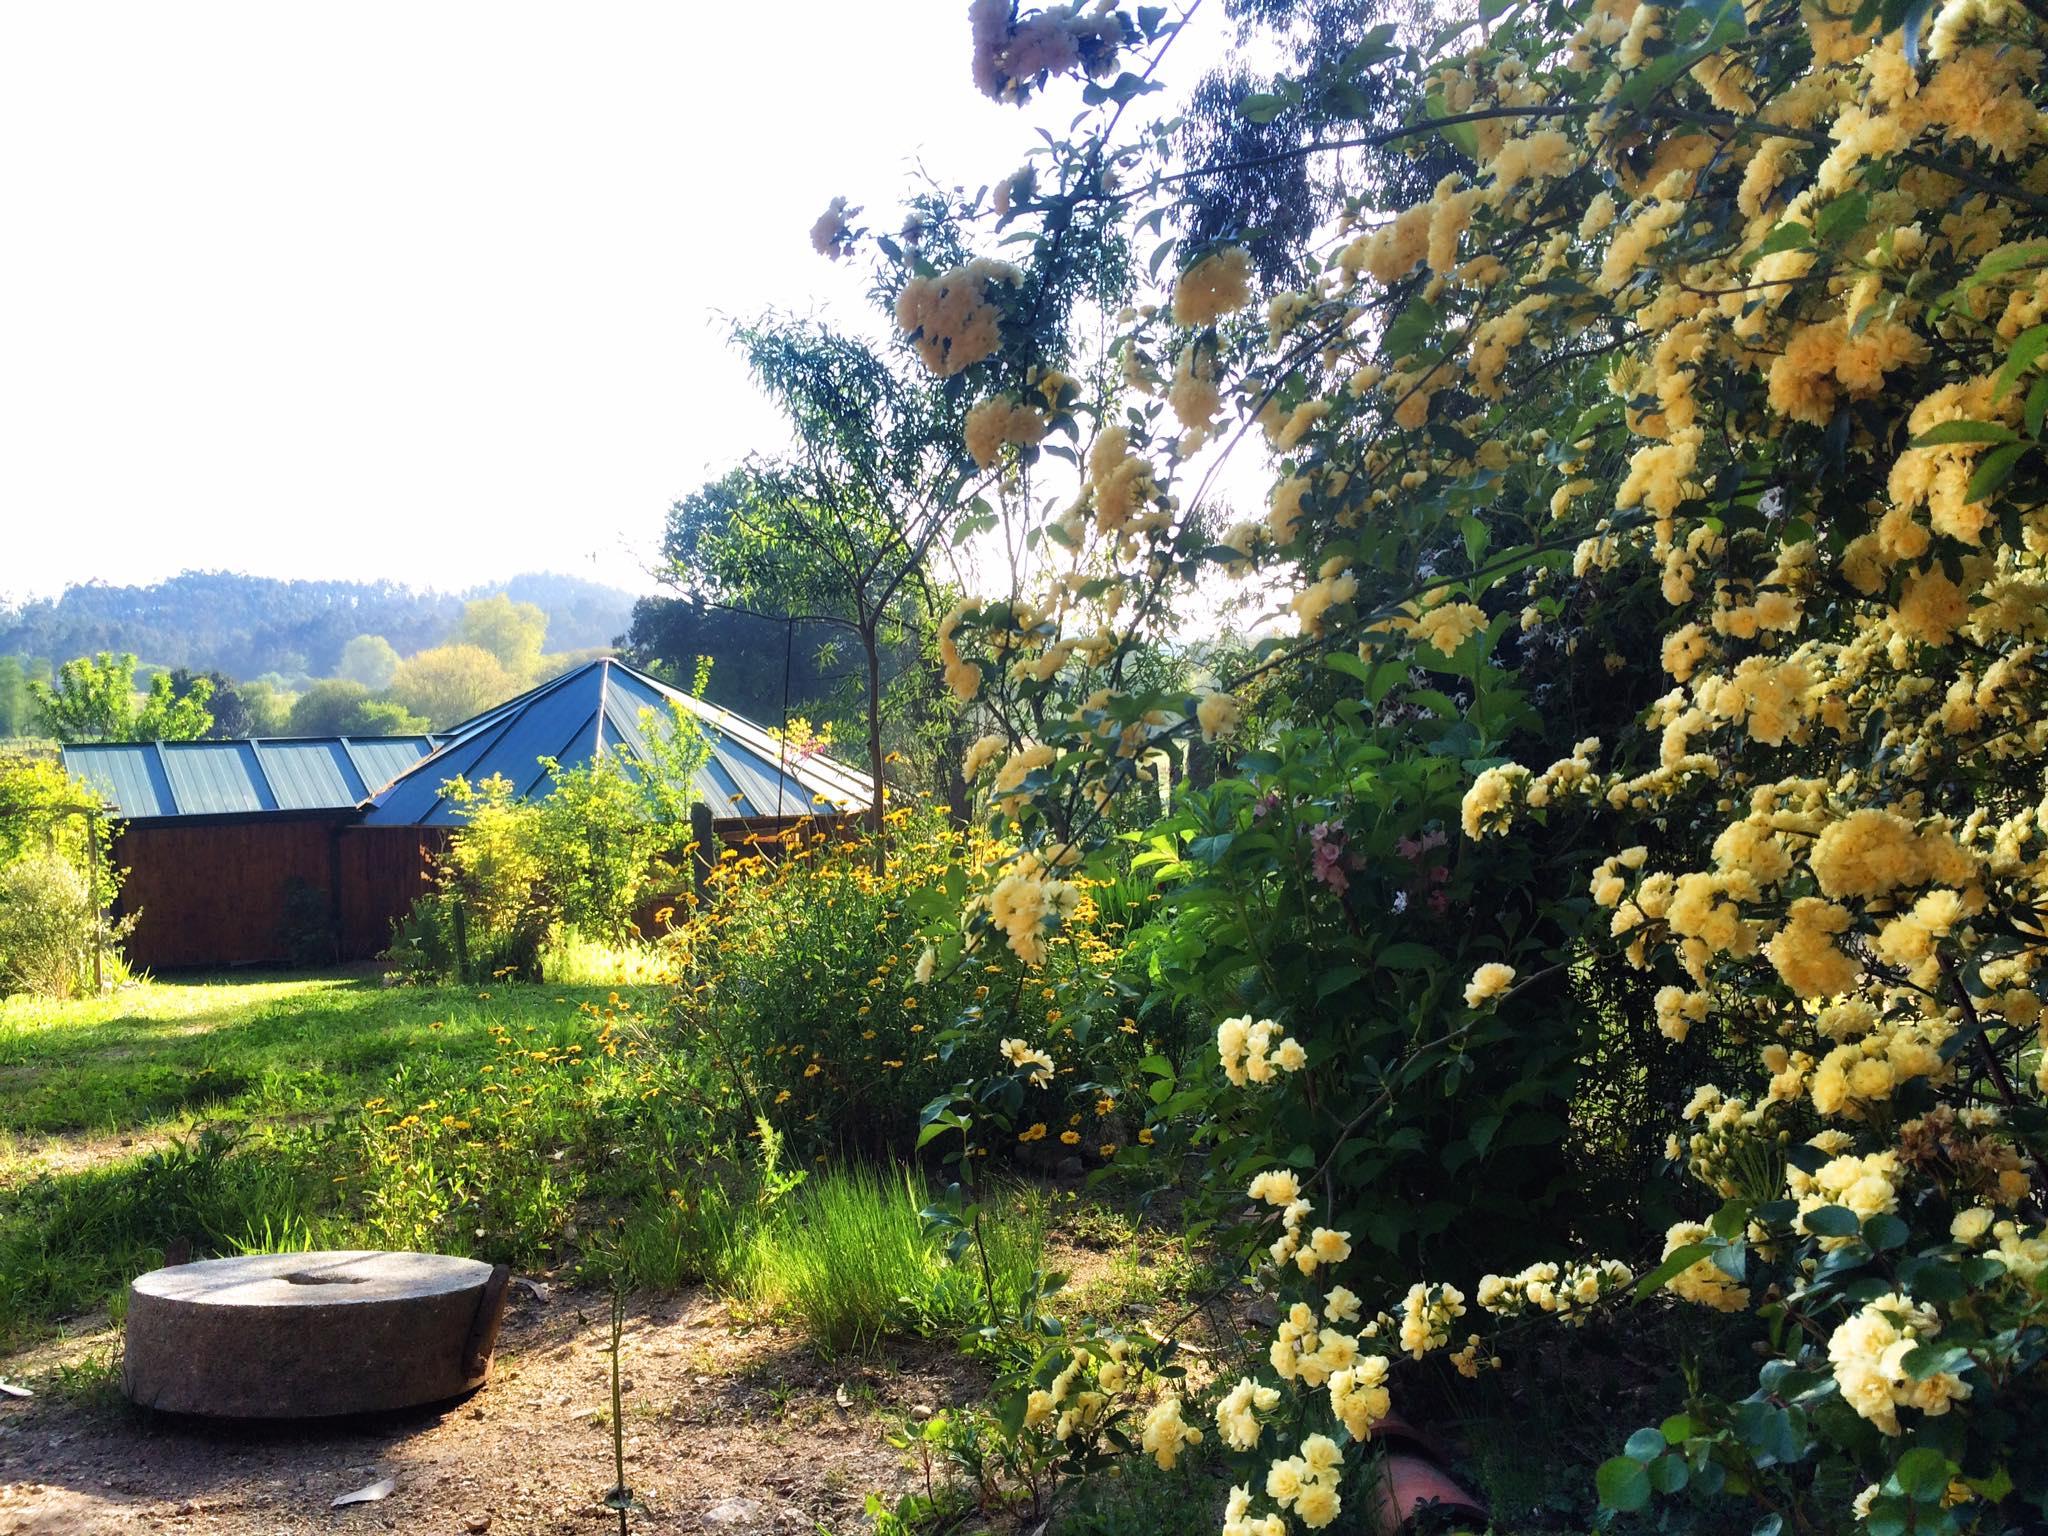 Jardin y templo Nixi Pae